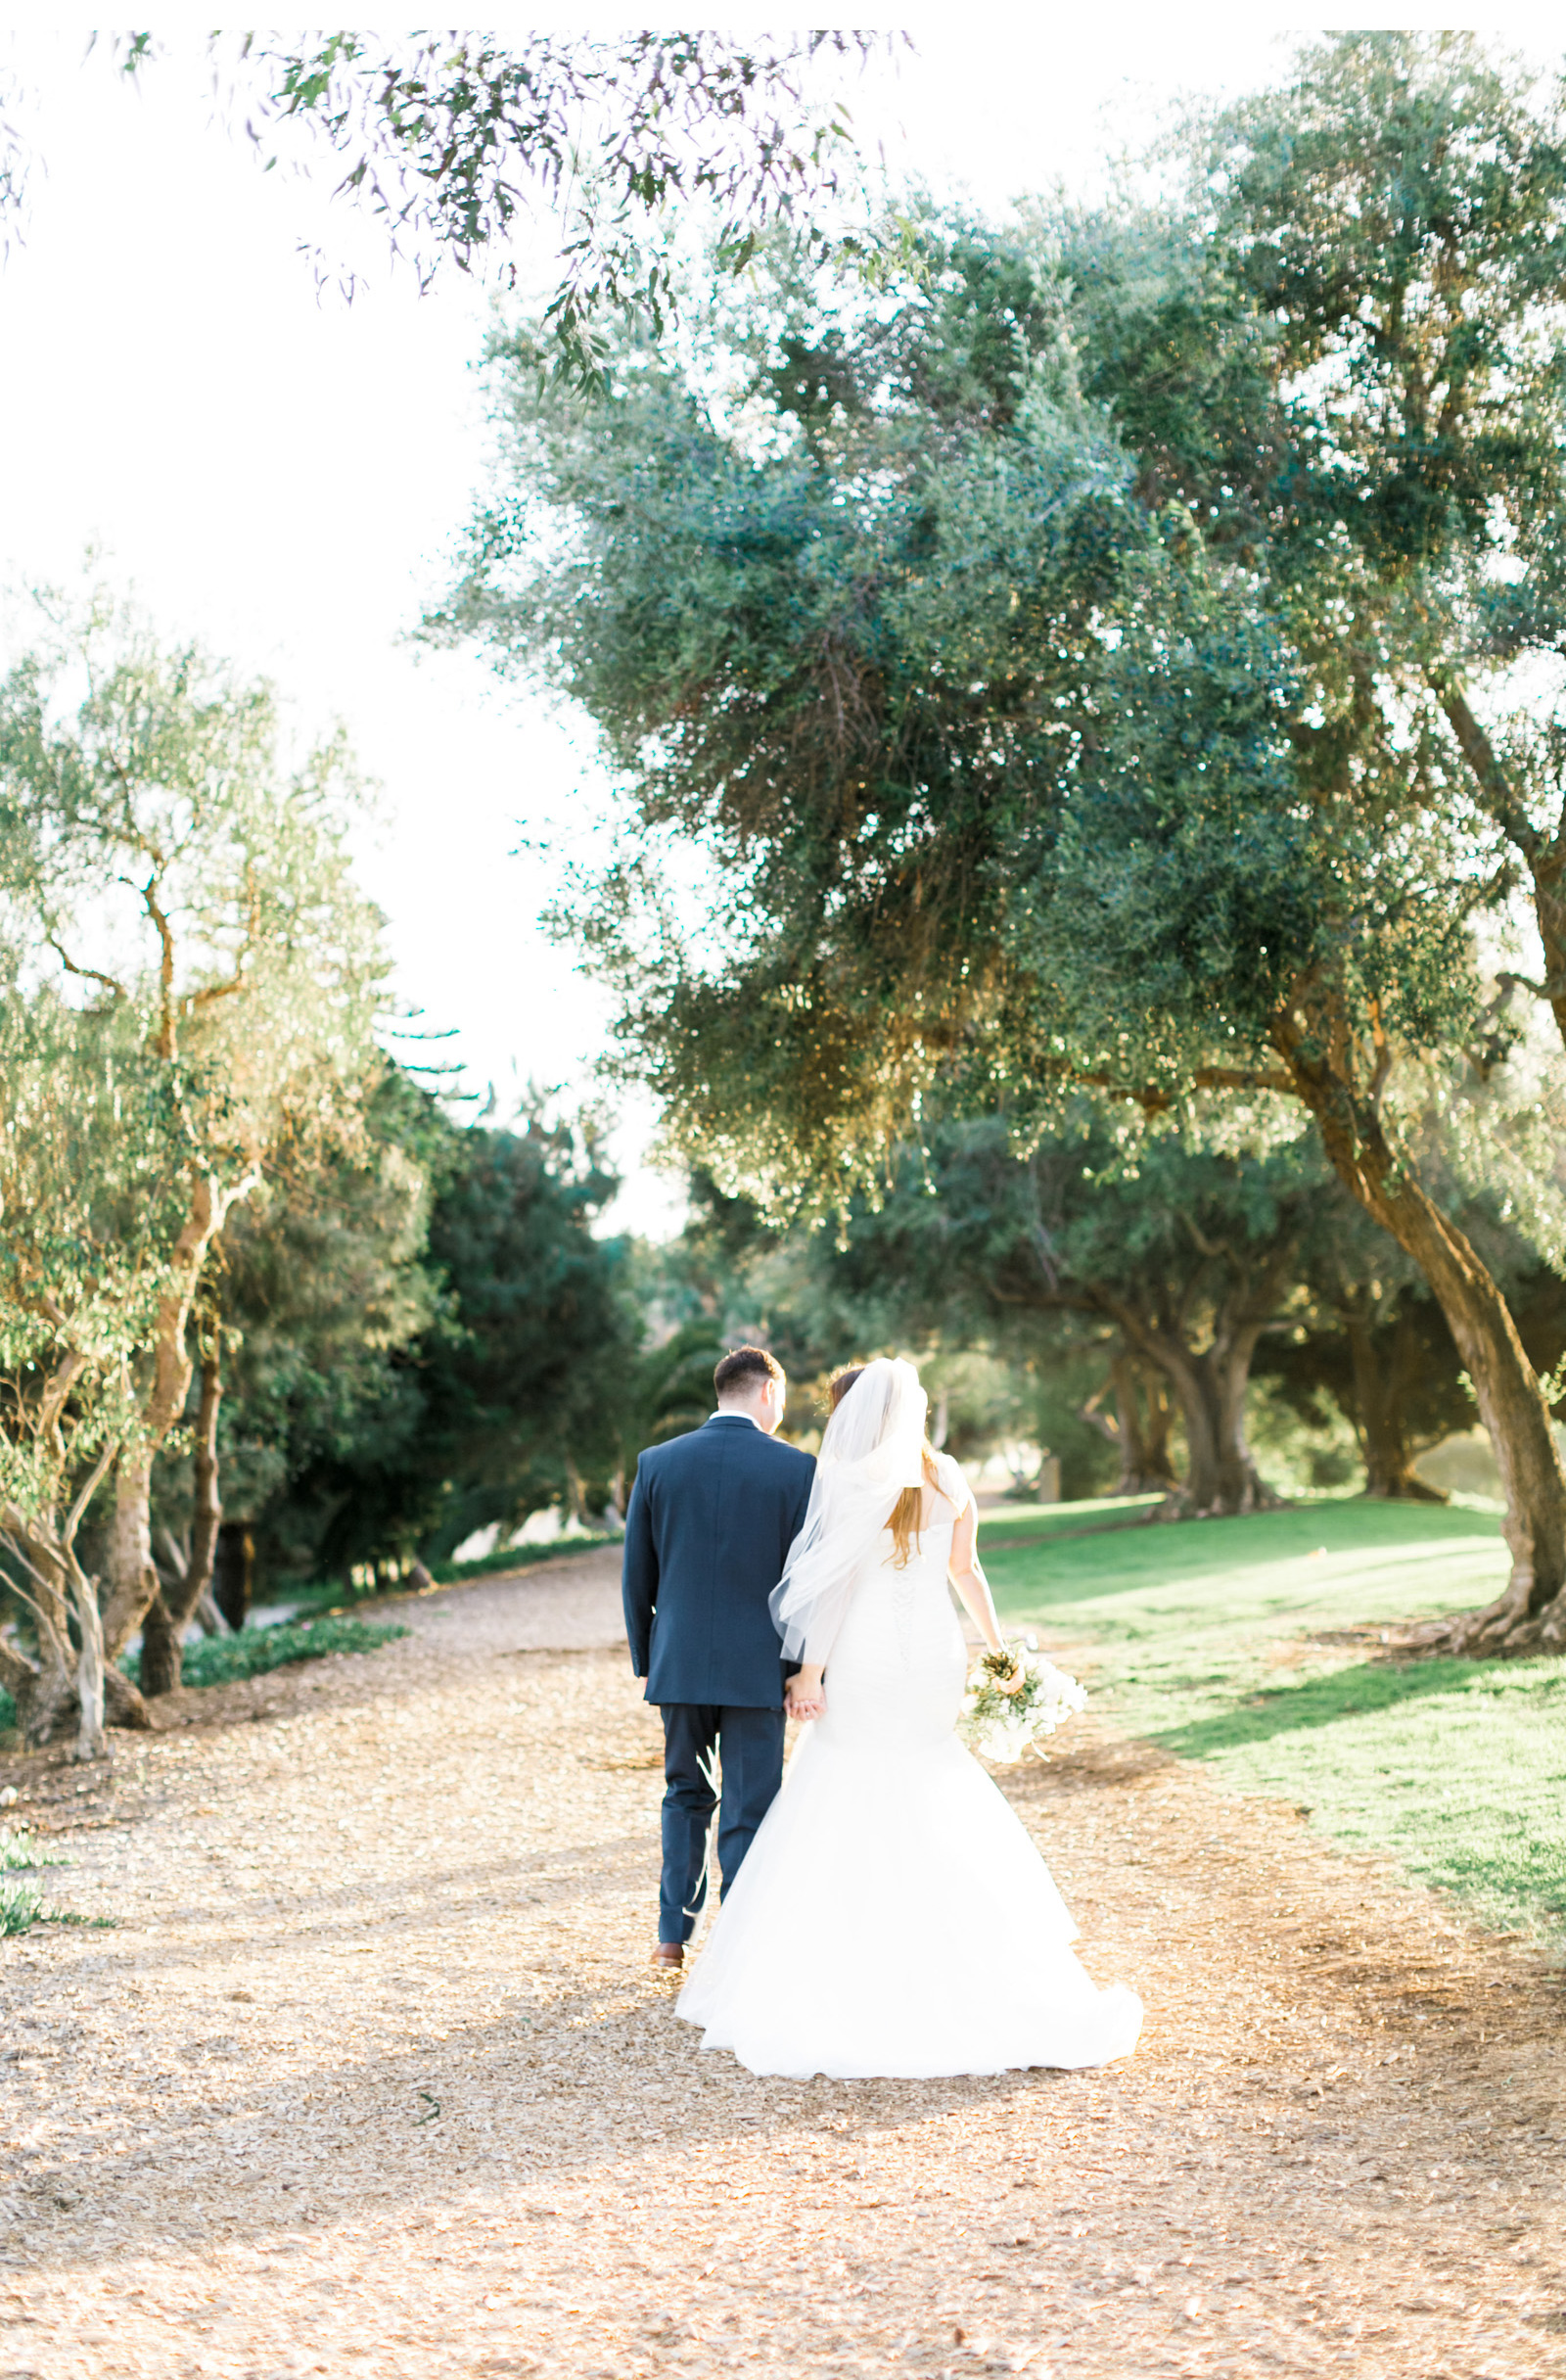 Backyard-Wedding-Southern-CA-Natalie-Schutt-Photography_03.jpg